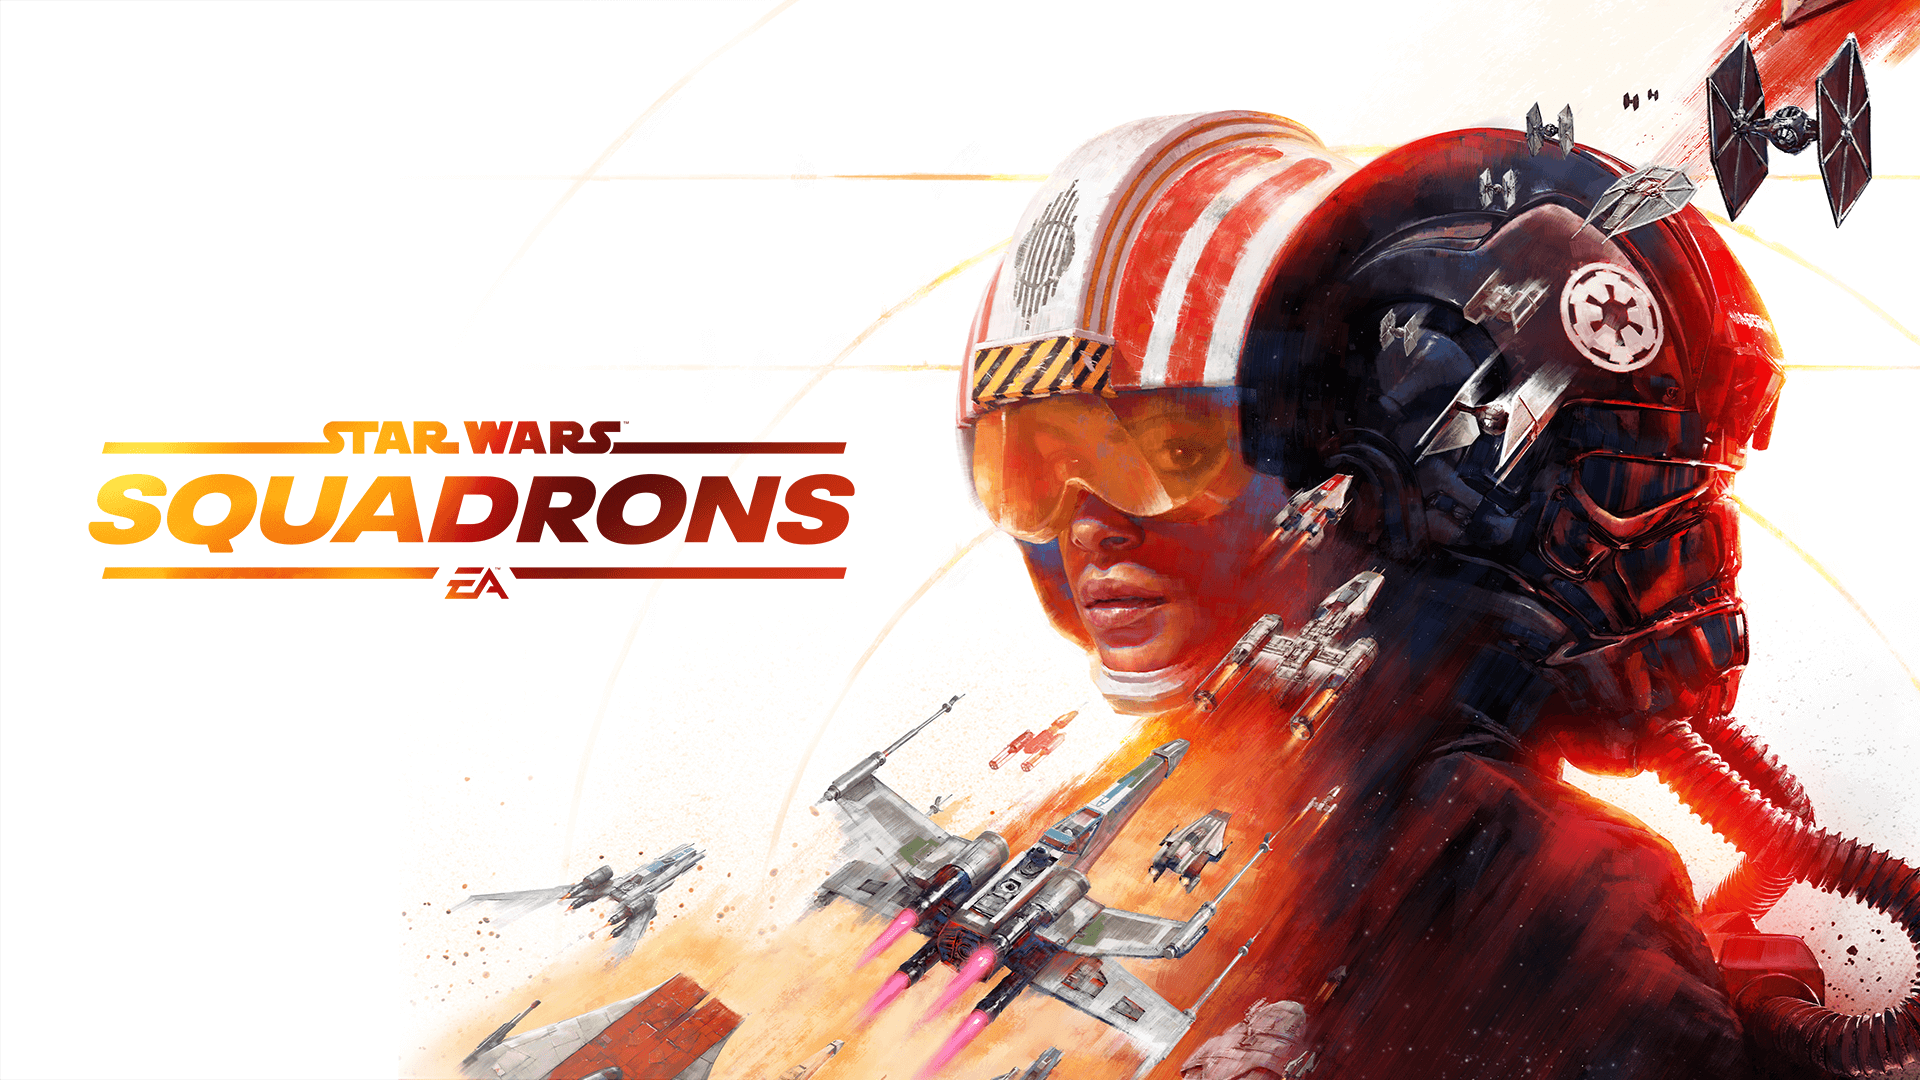 Star Wars: Squadrons review | GodisaGeek.com